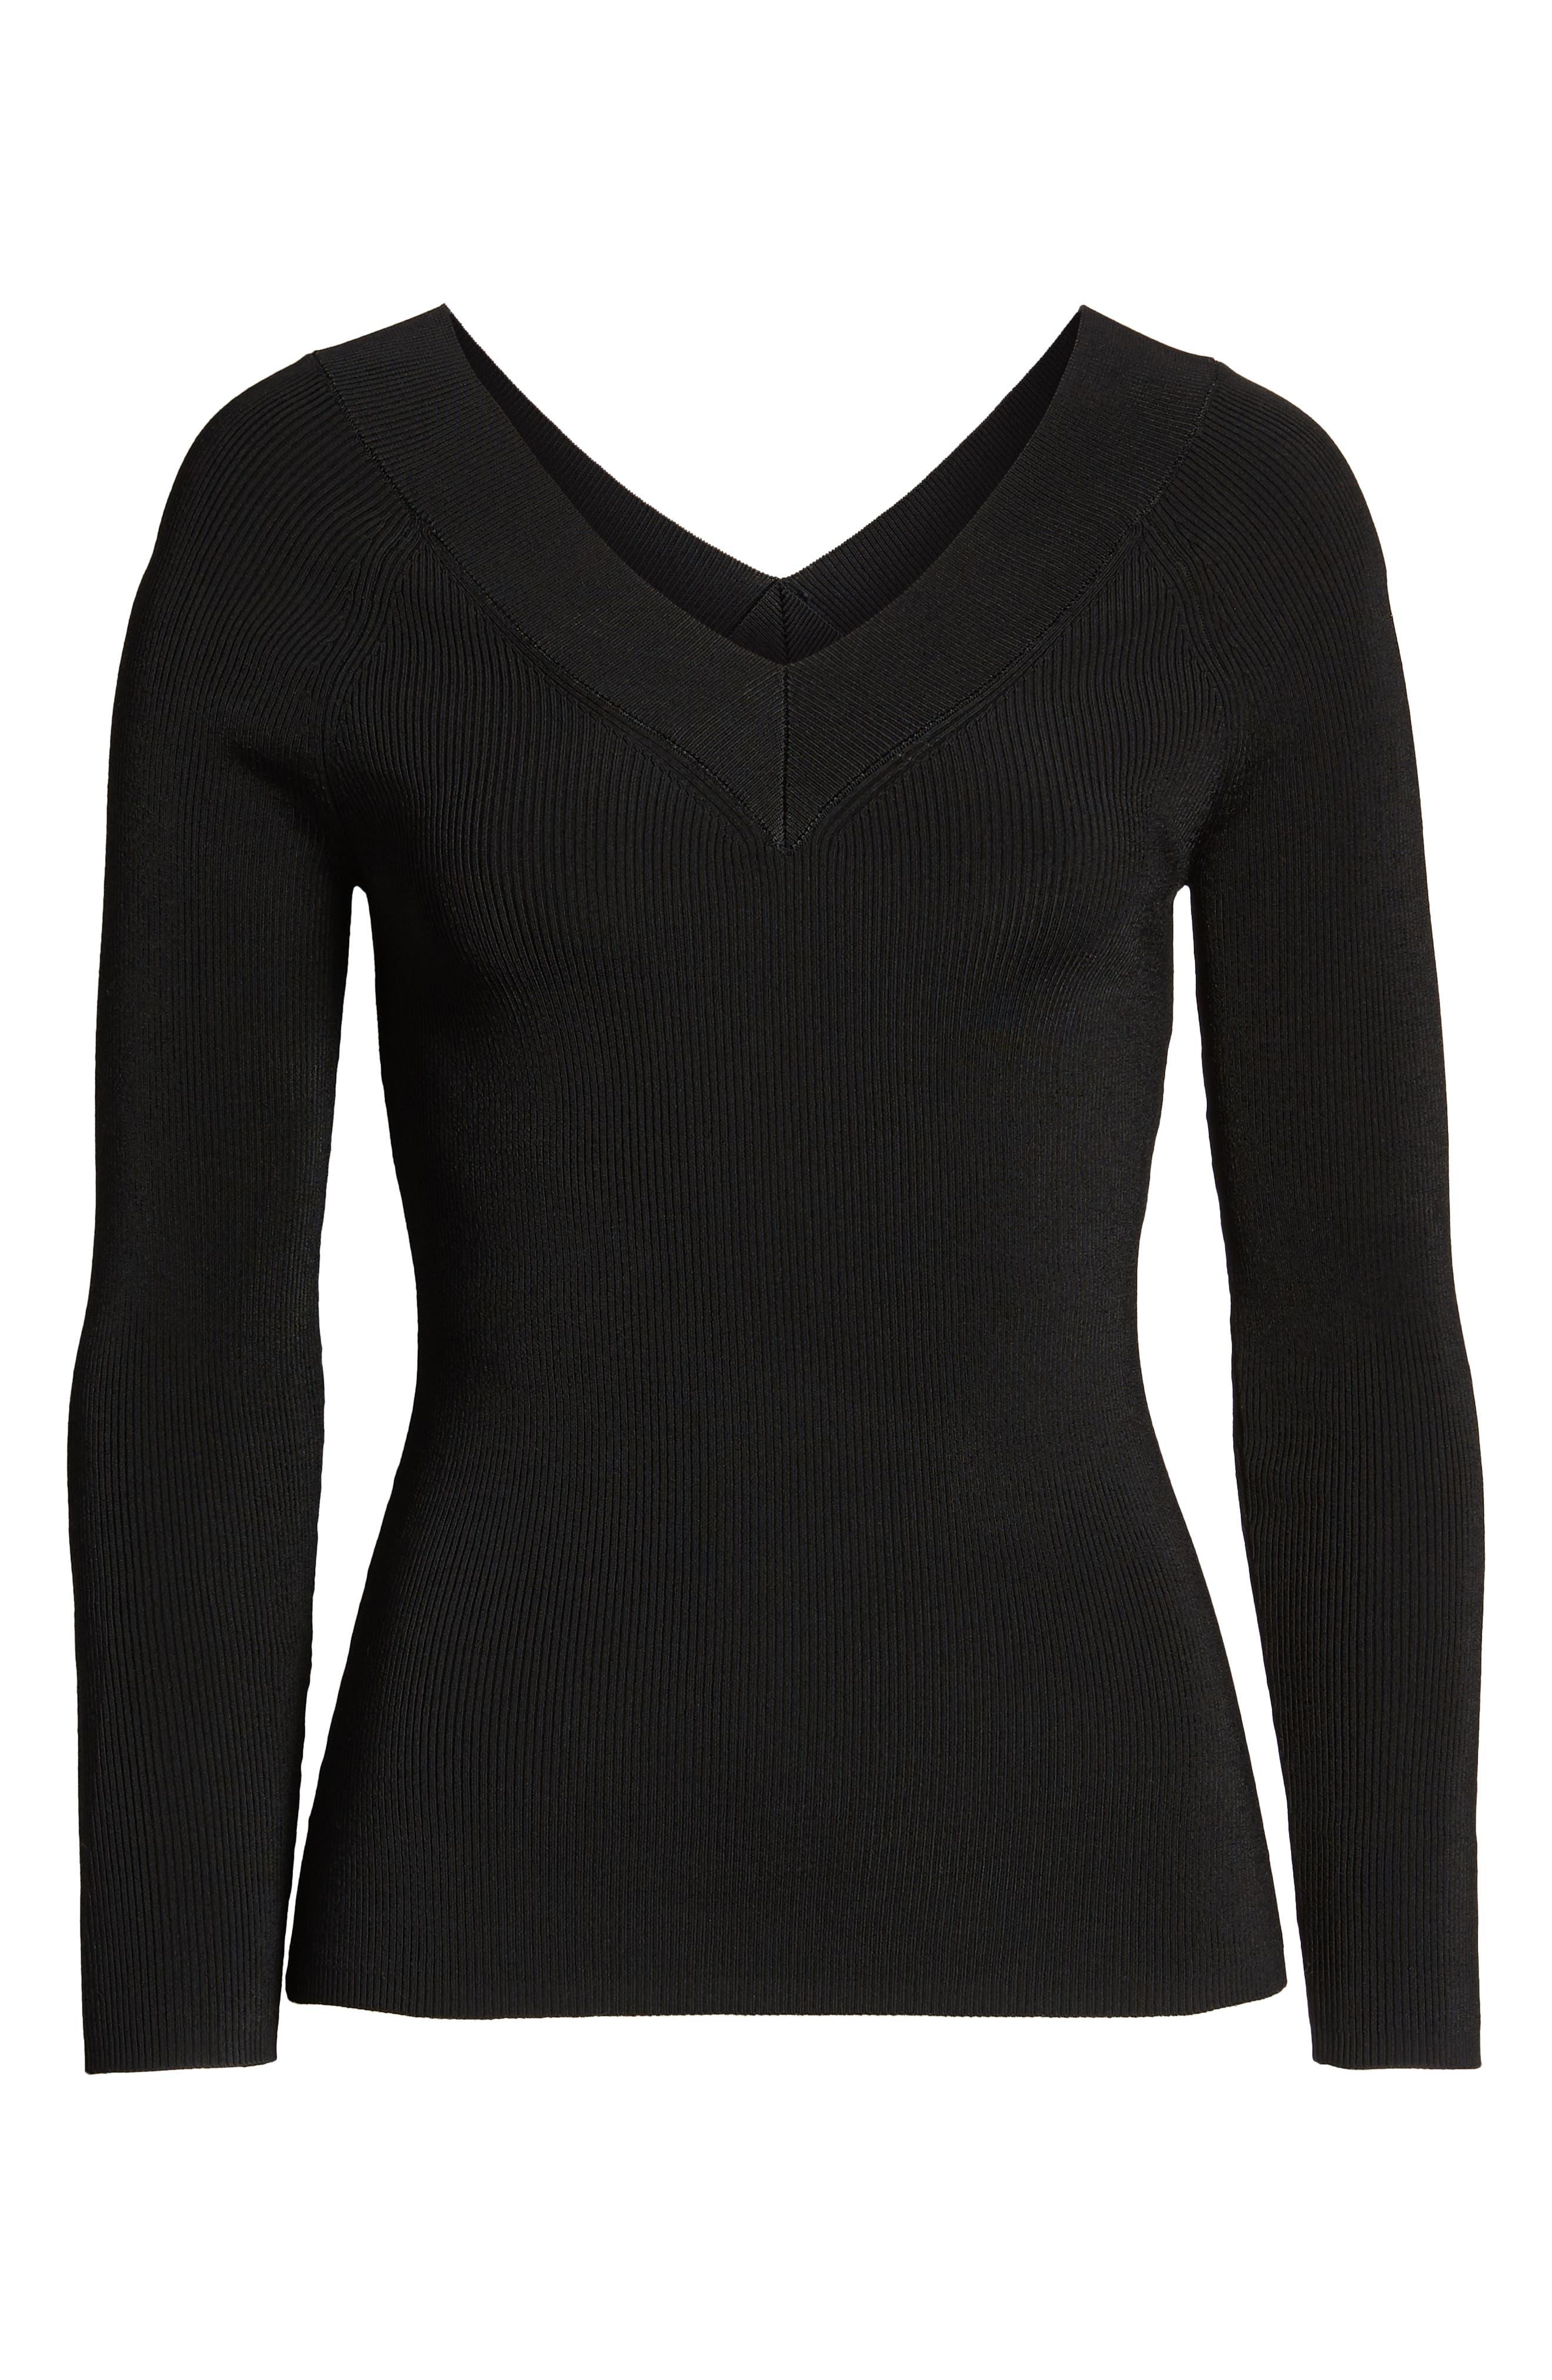 Skivvy Double-V Sweater,                             Alternate thumbnail 6, color,                             001